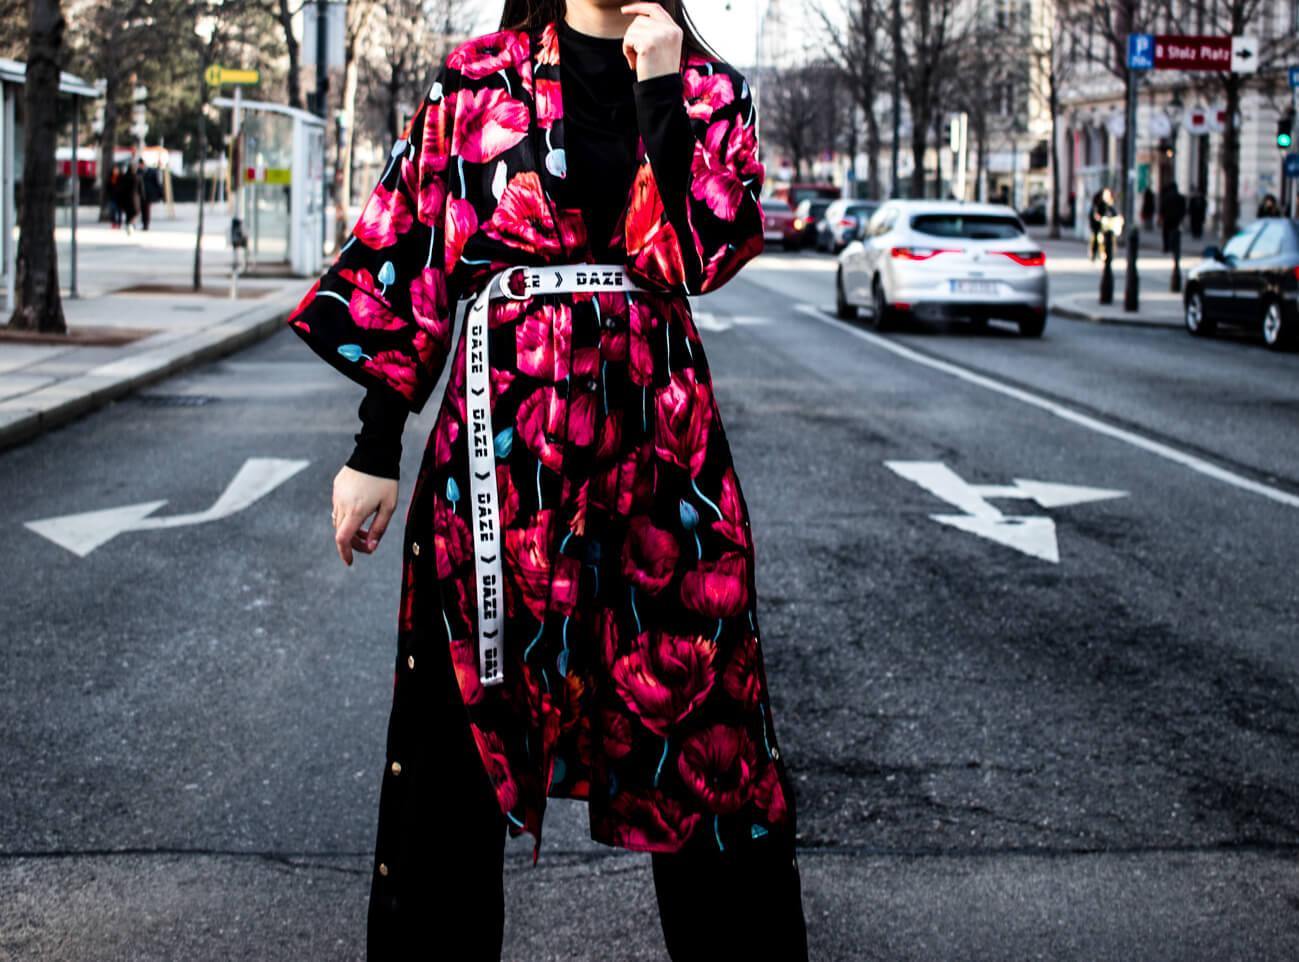 Stylings Regeln für den Kimono